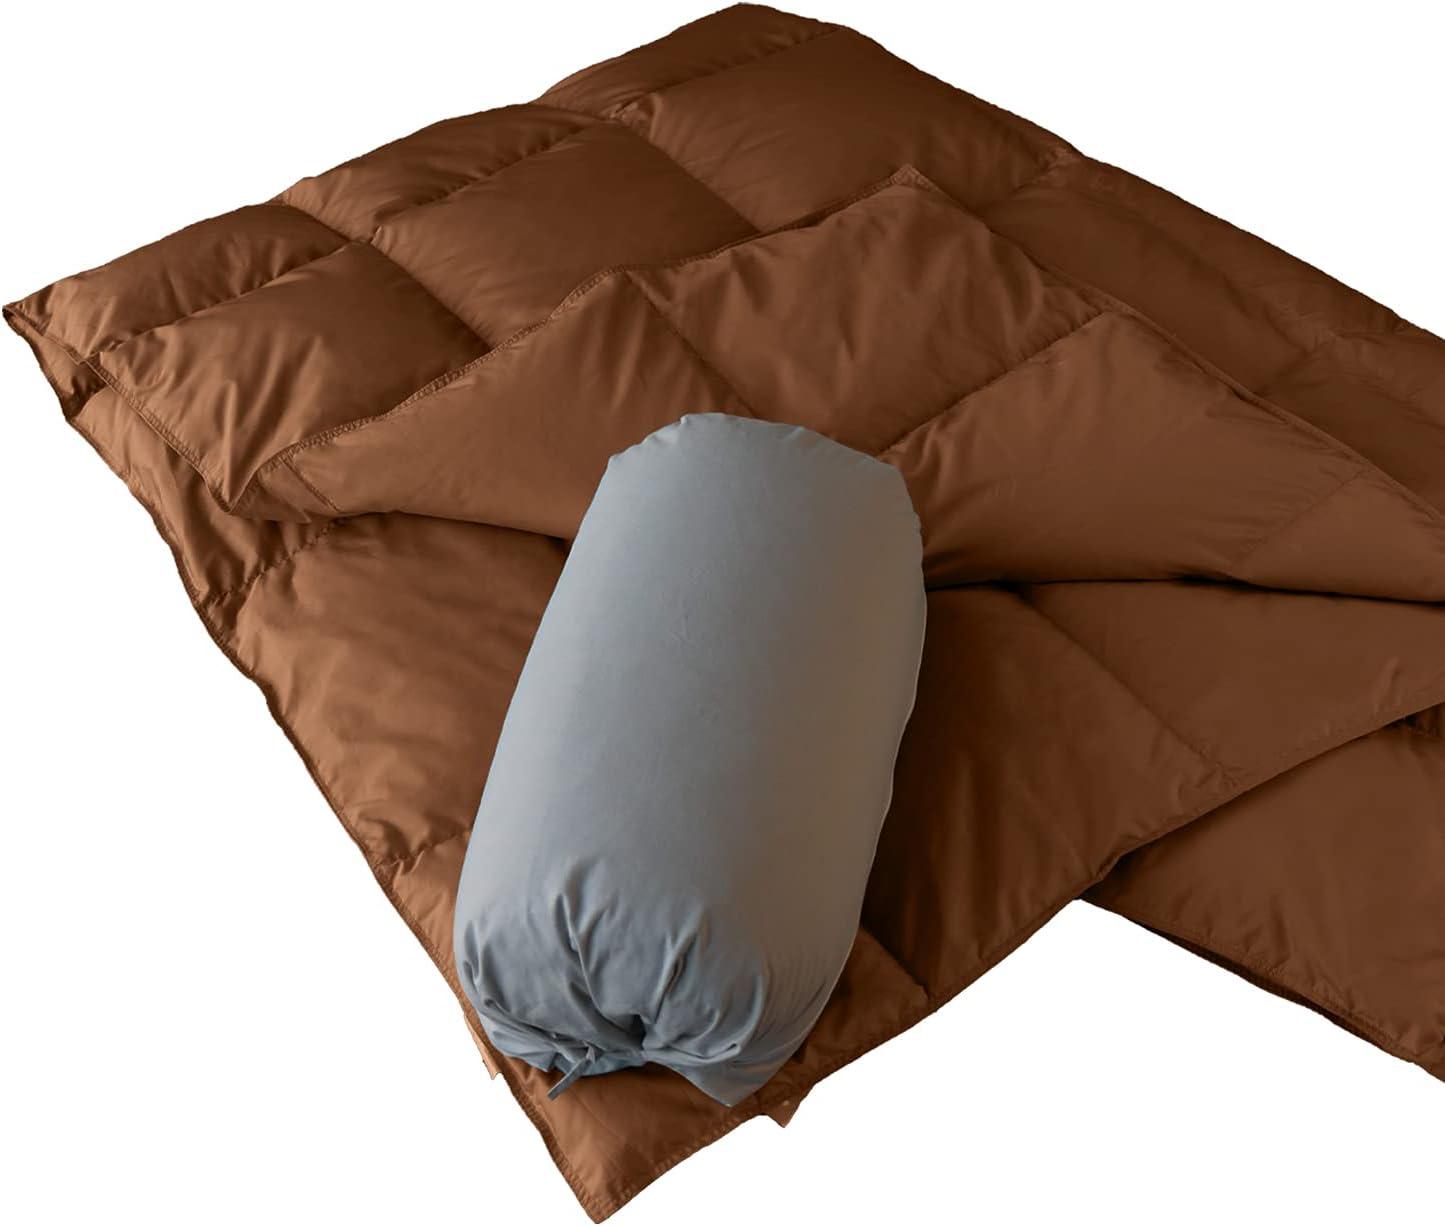 Atlanta store Mall zZFocus Goose Down Blanket Fluffy Port Compact Warm Lightweight